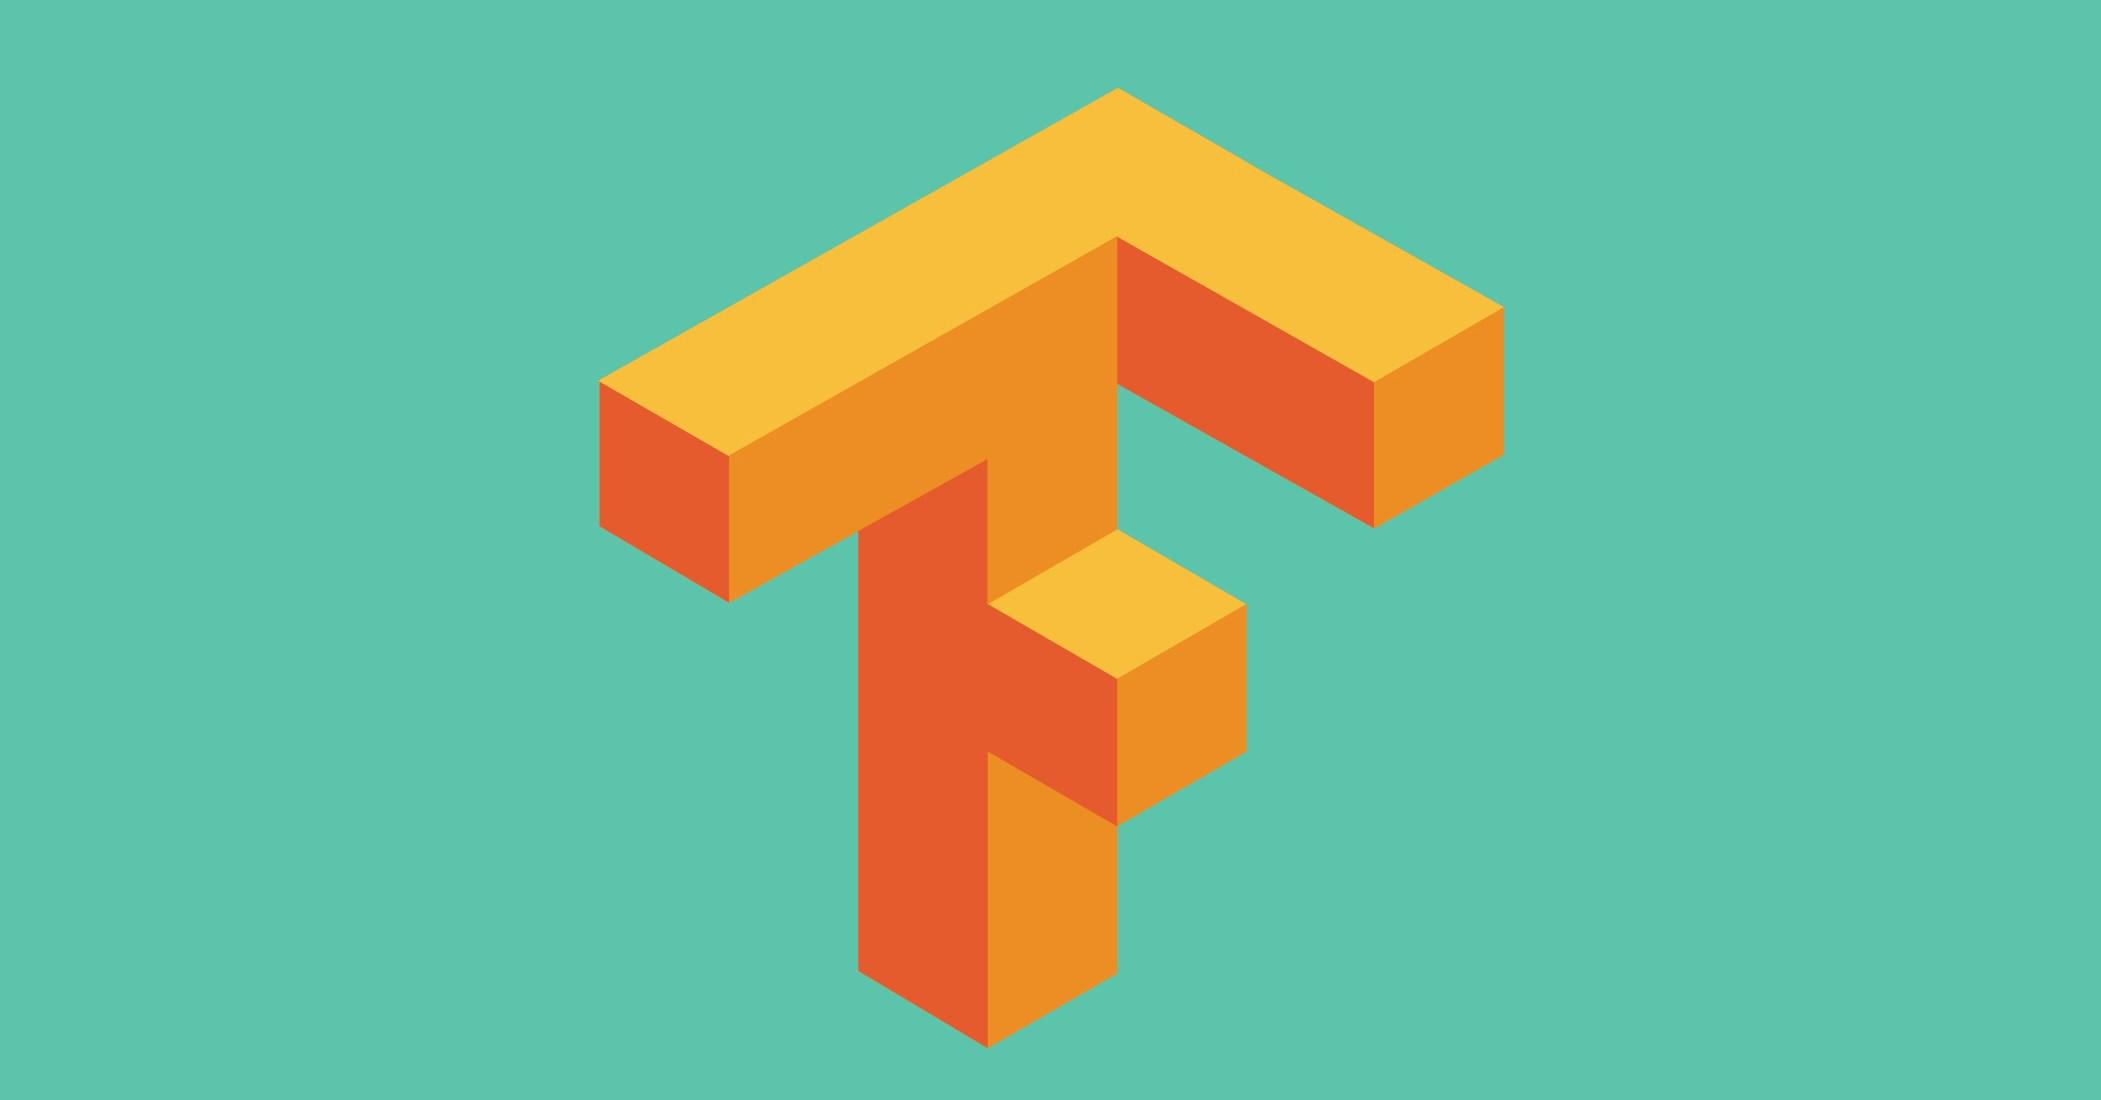 /tensorflow-is-dead-long-live-tensorflow-49d3e975cf04 feature image